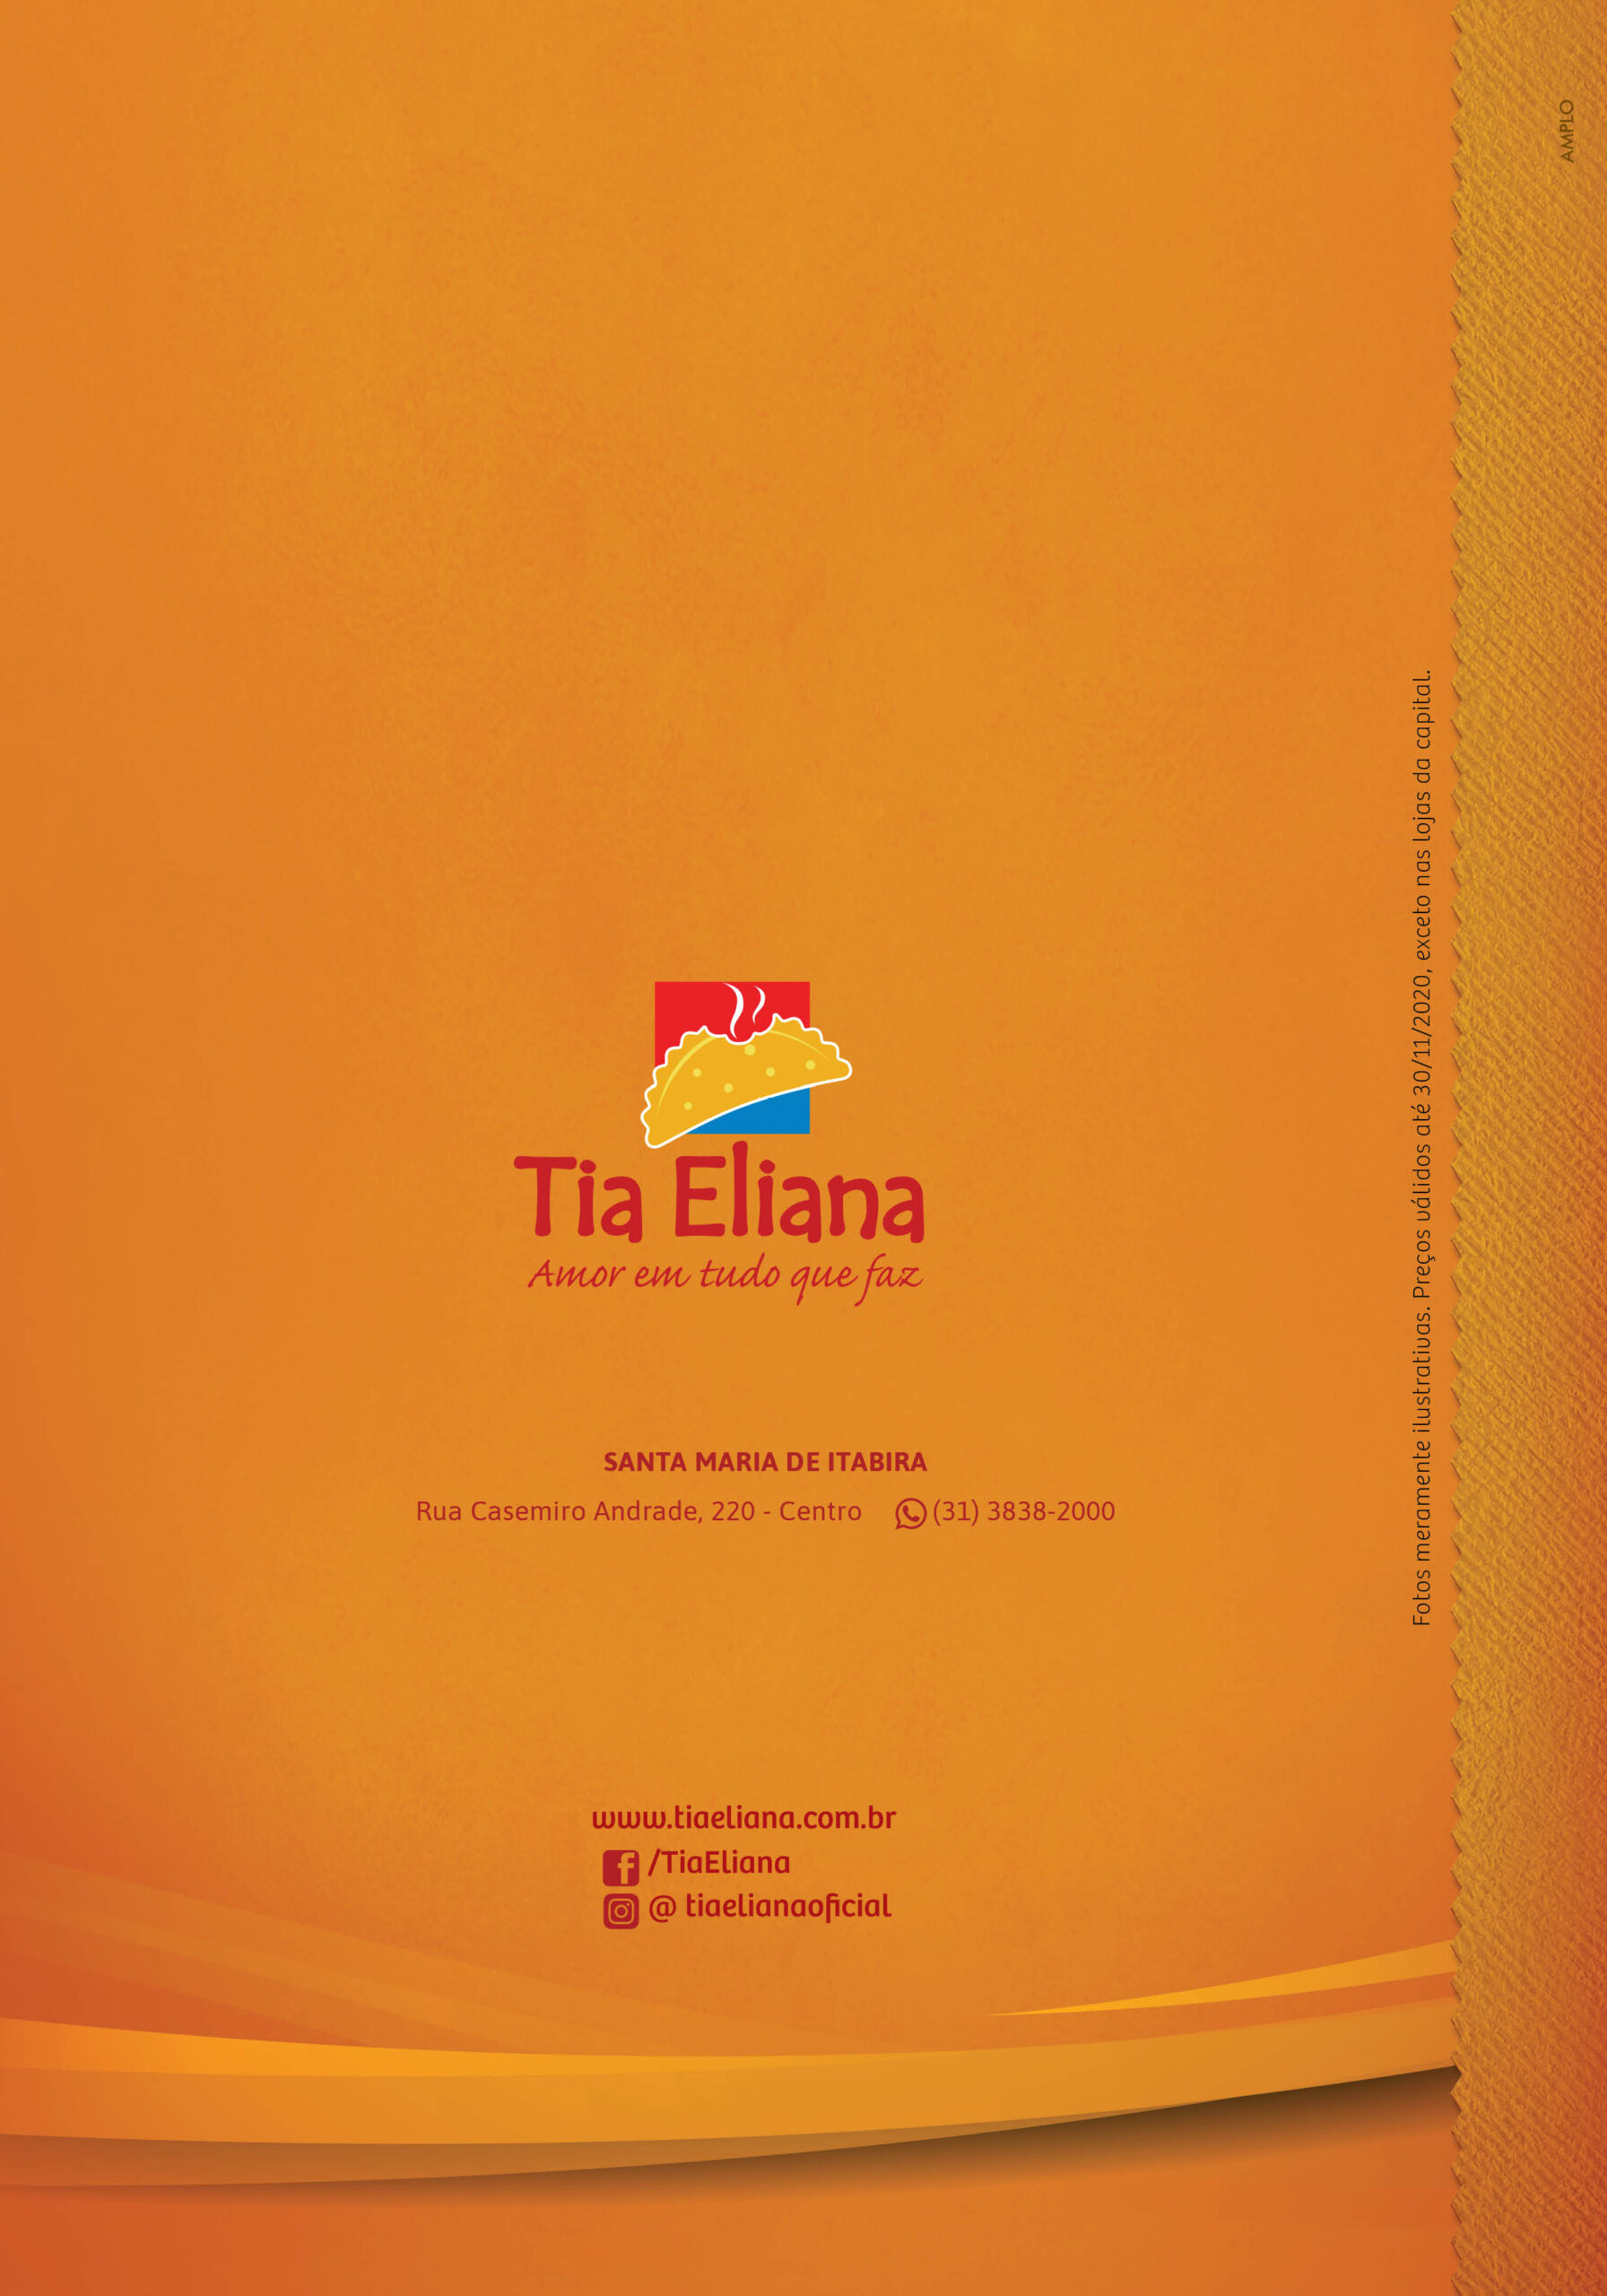 cardapio_completo_interior_a4_2021_tia_eliana_santa_maria_itabira12-scaled Santa Maria de Itabira